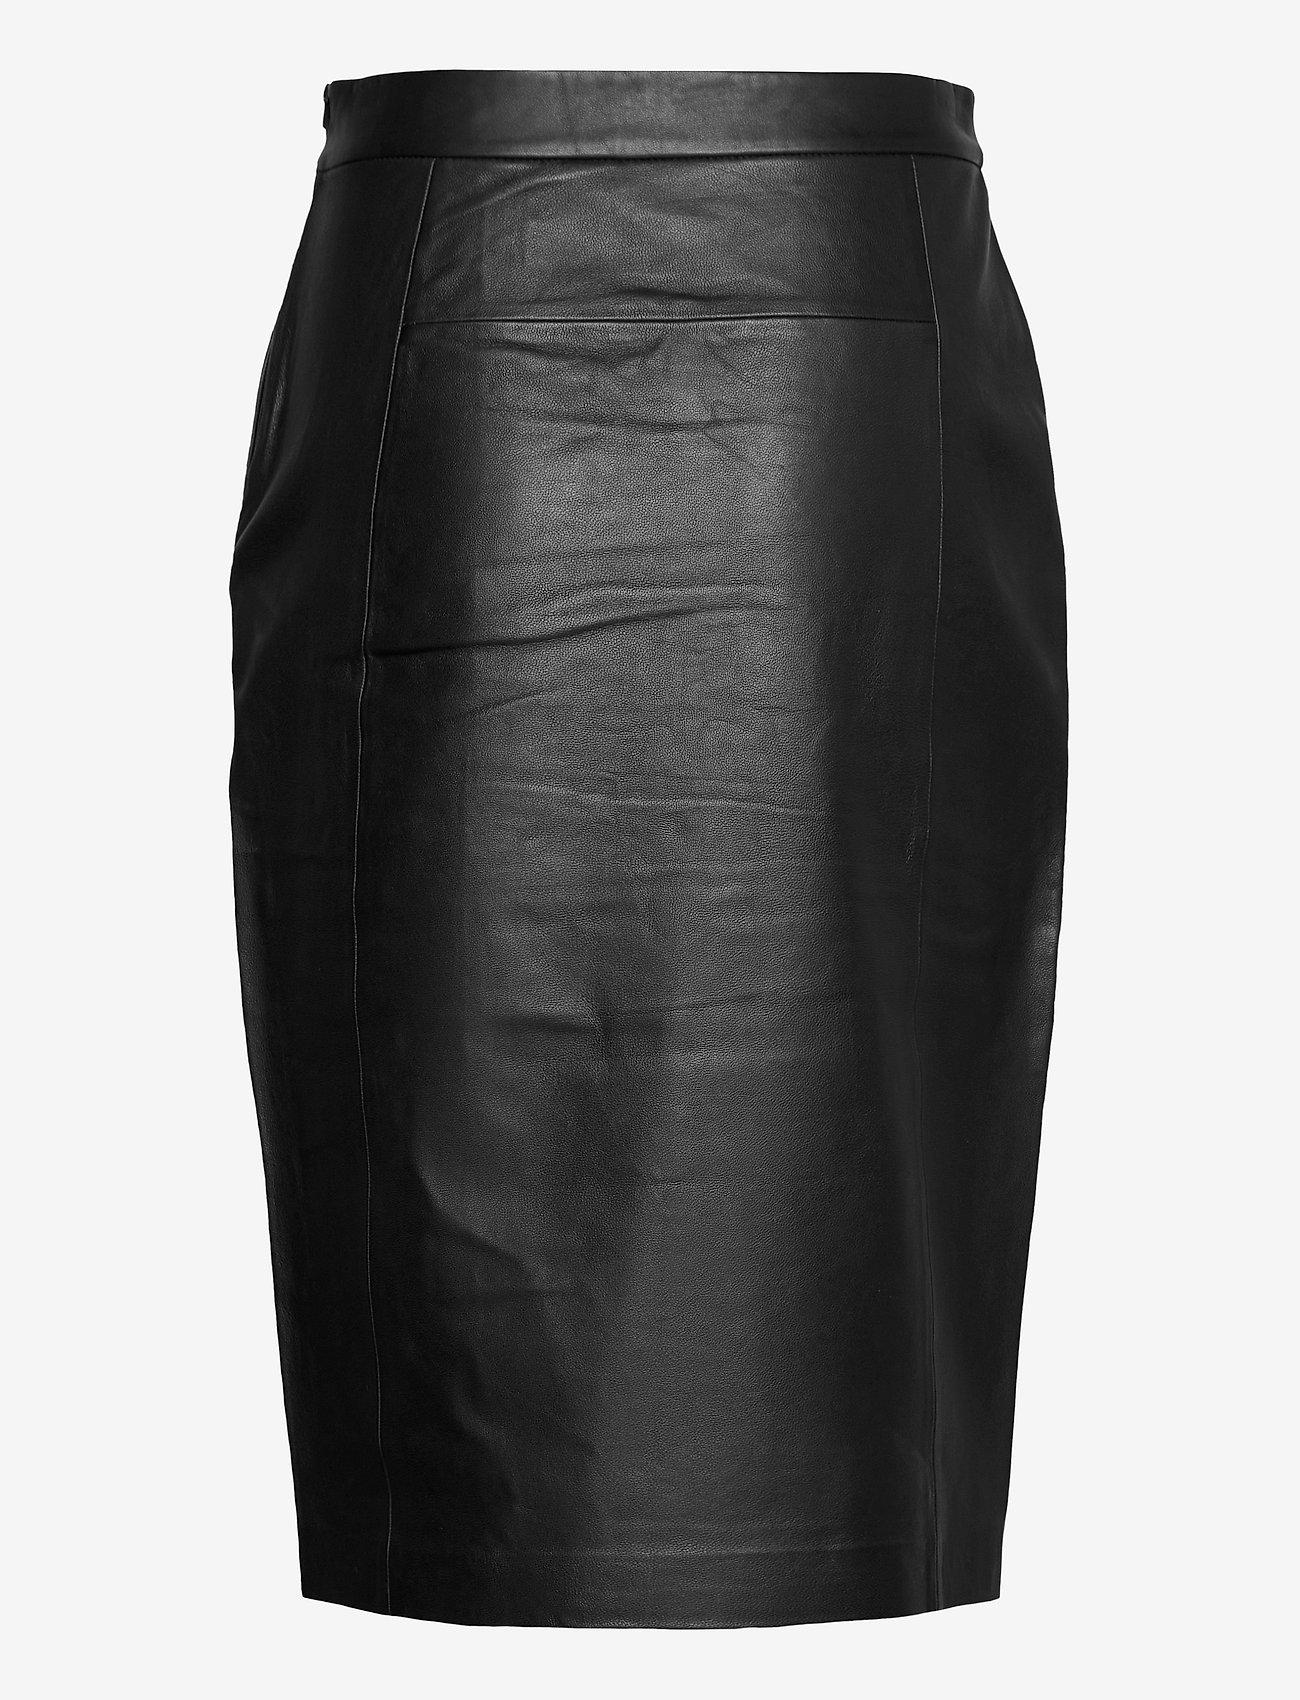 Thousand skirt day-2